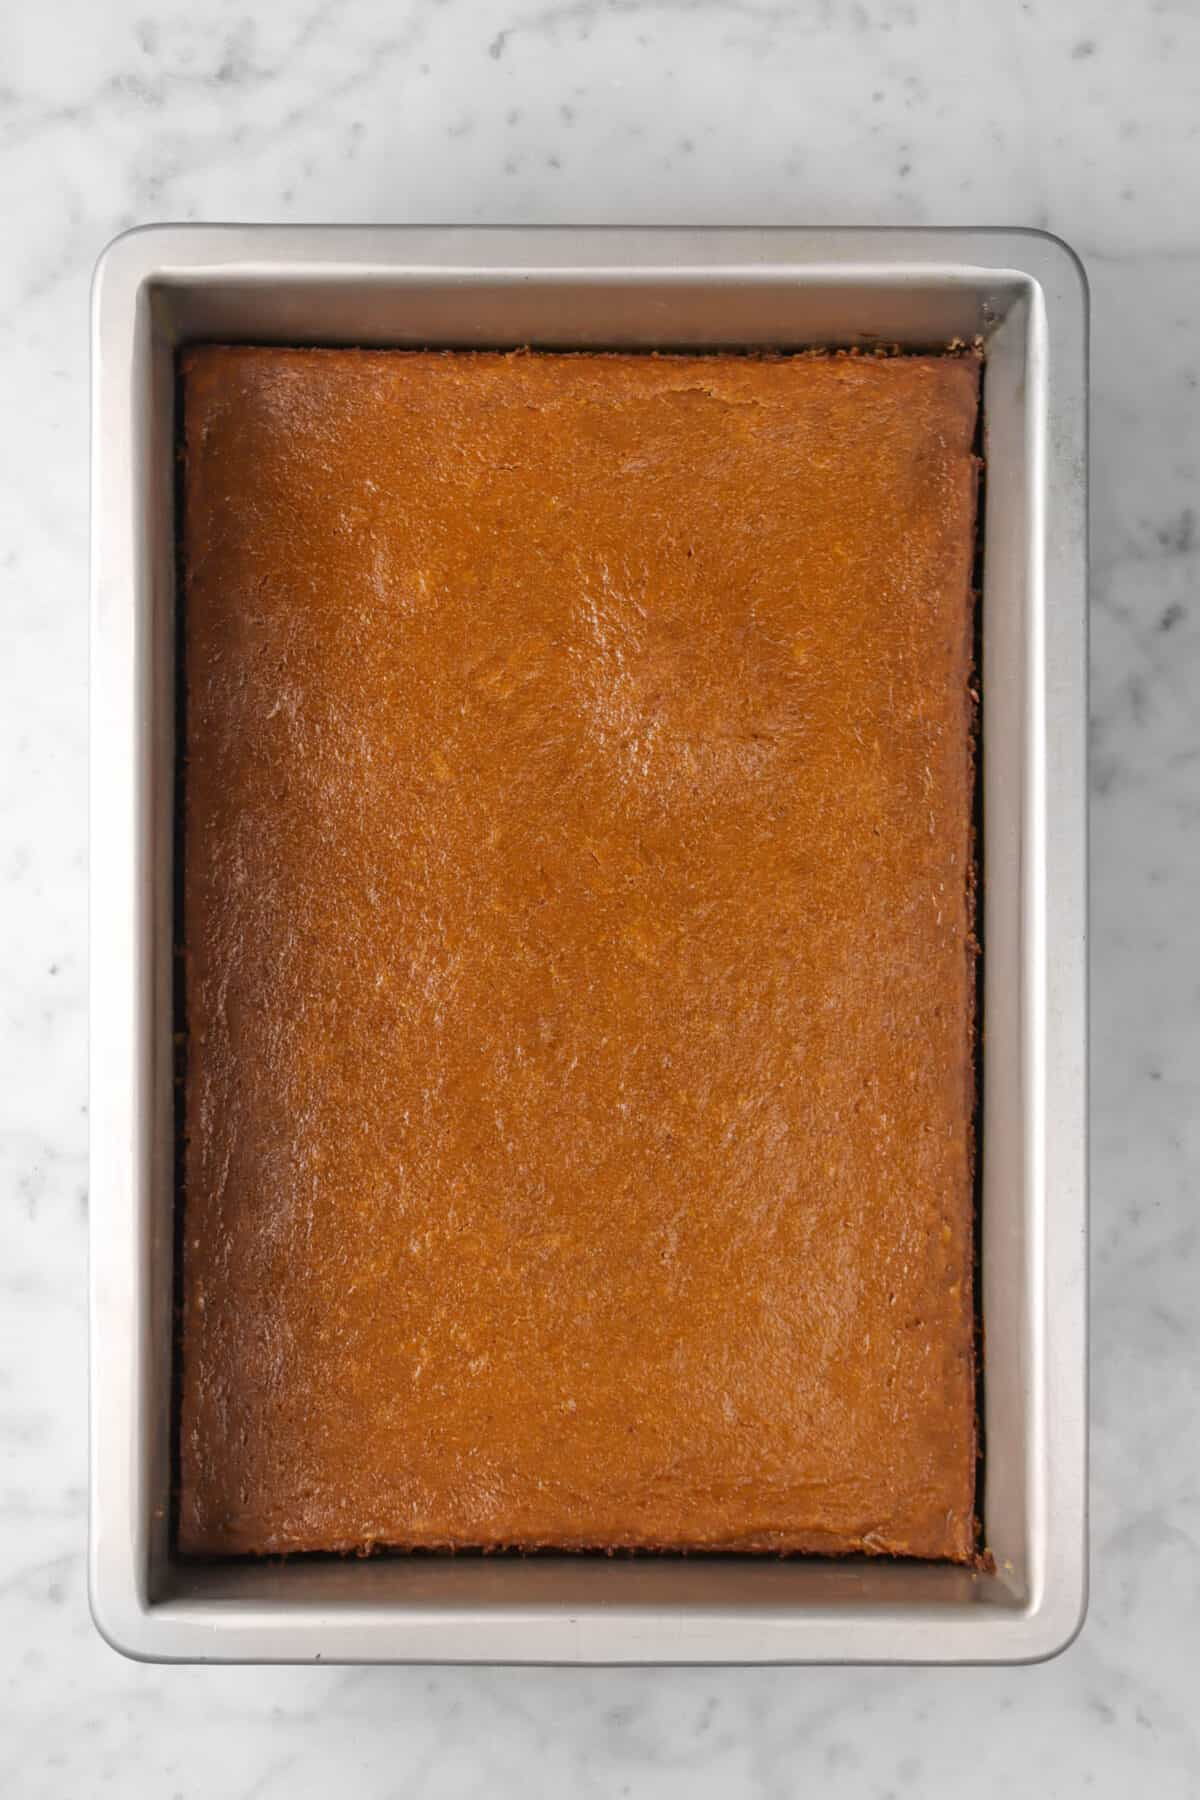 pumpkin pie bars baked in a pan